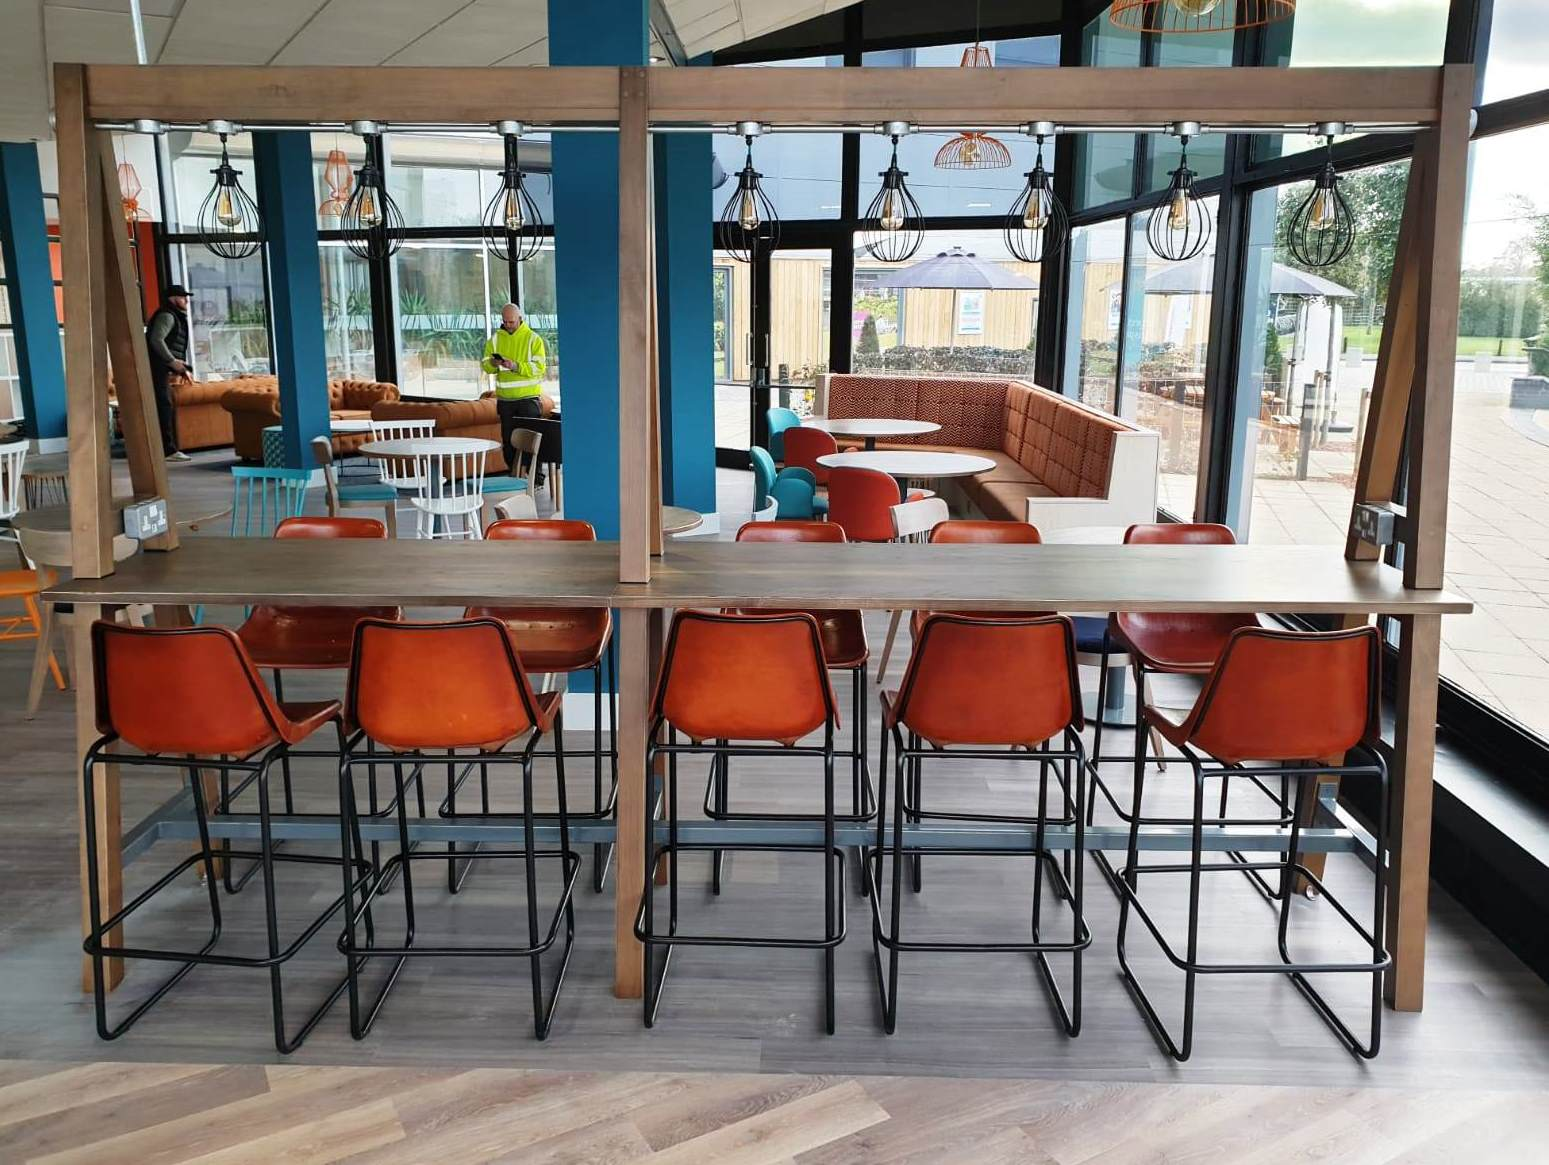 The Centre Cafe, Birchwood